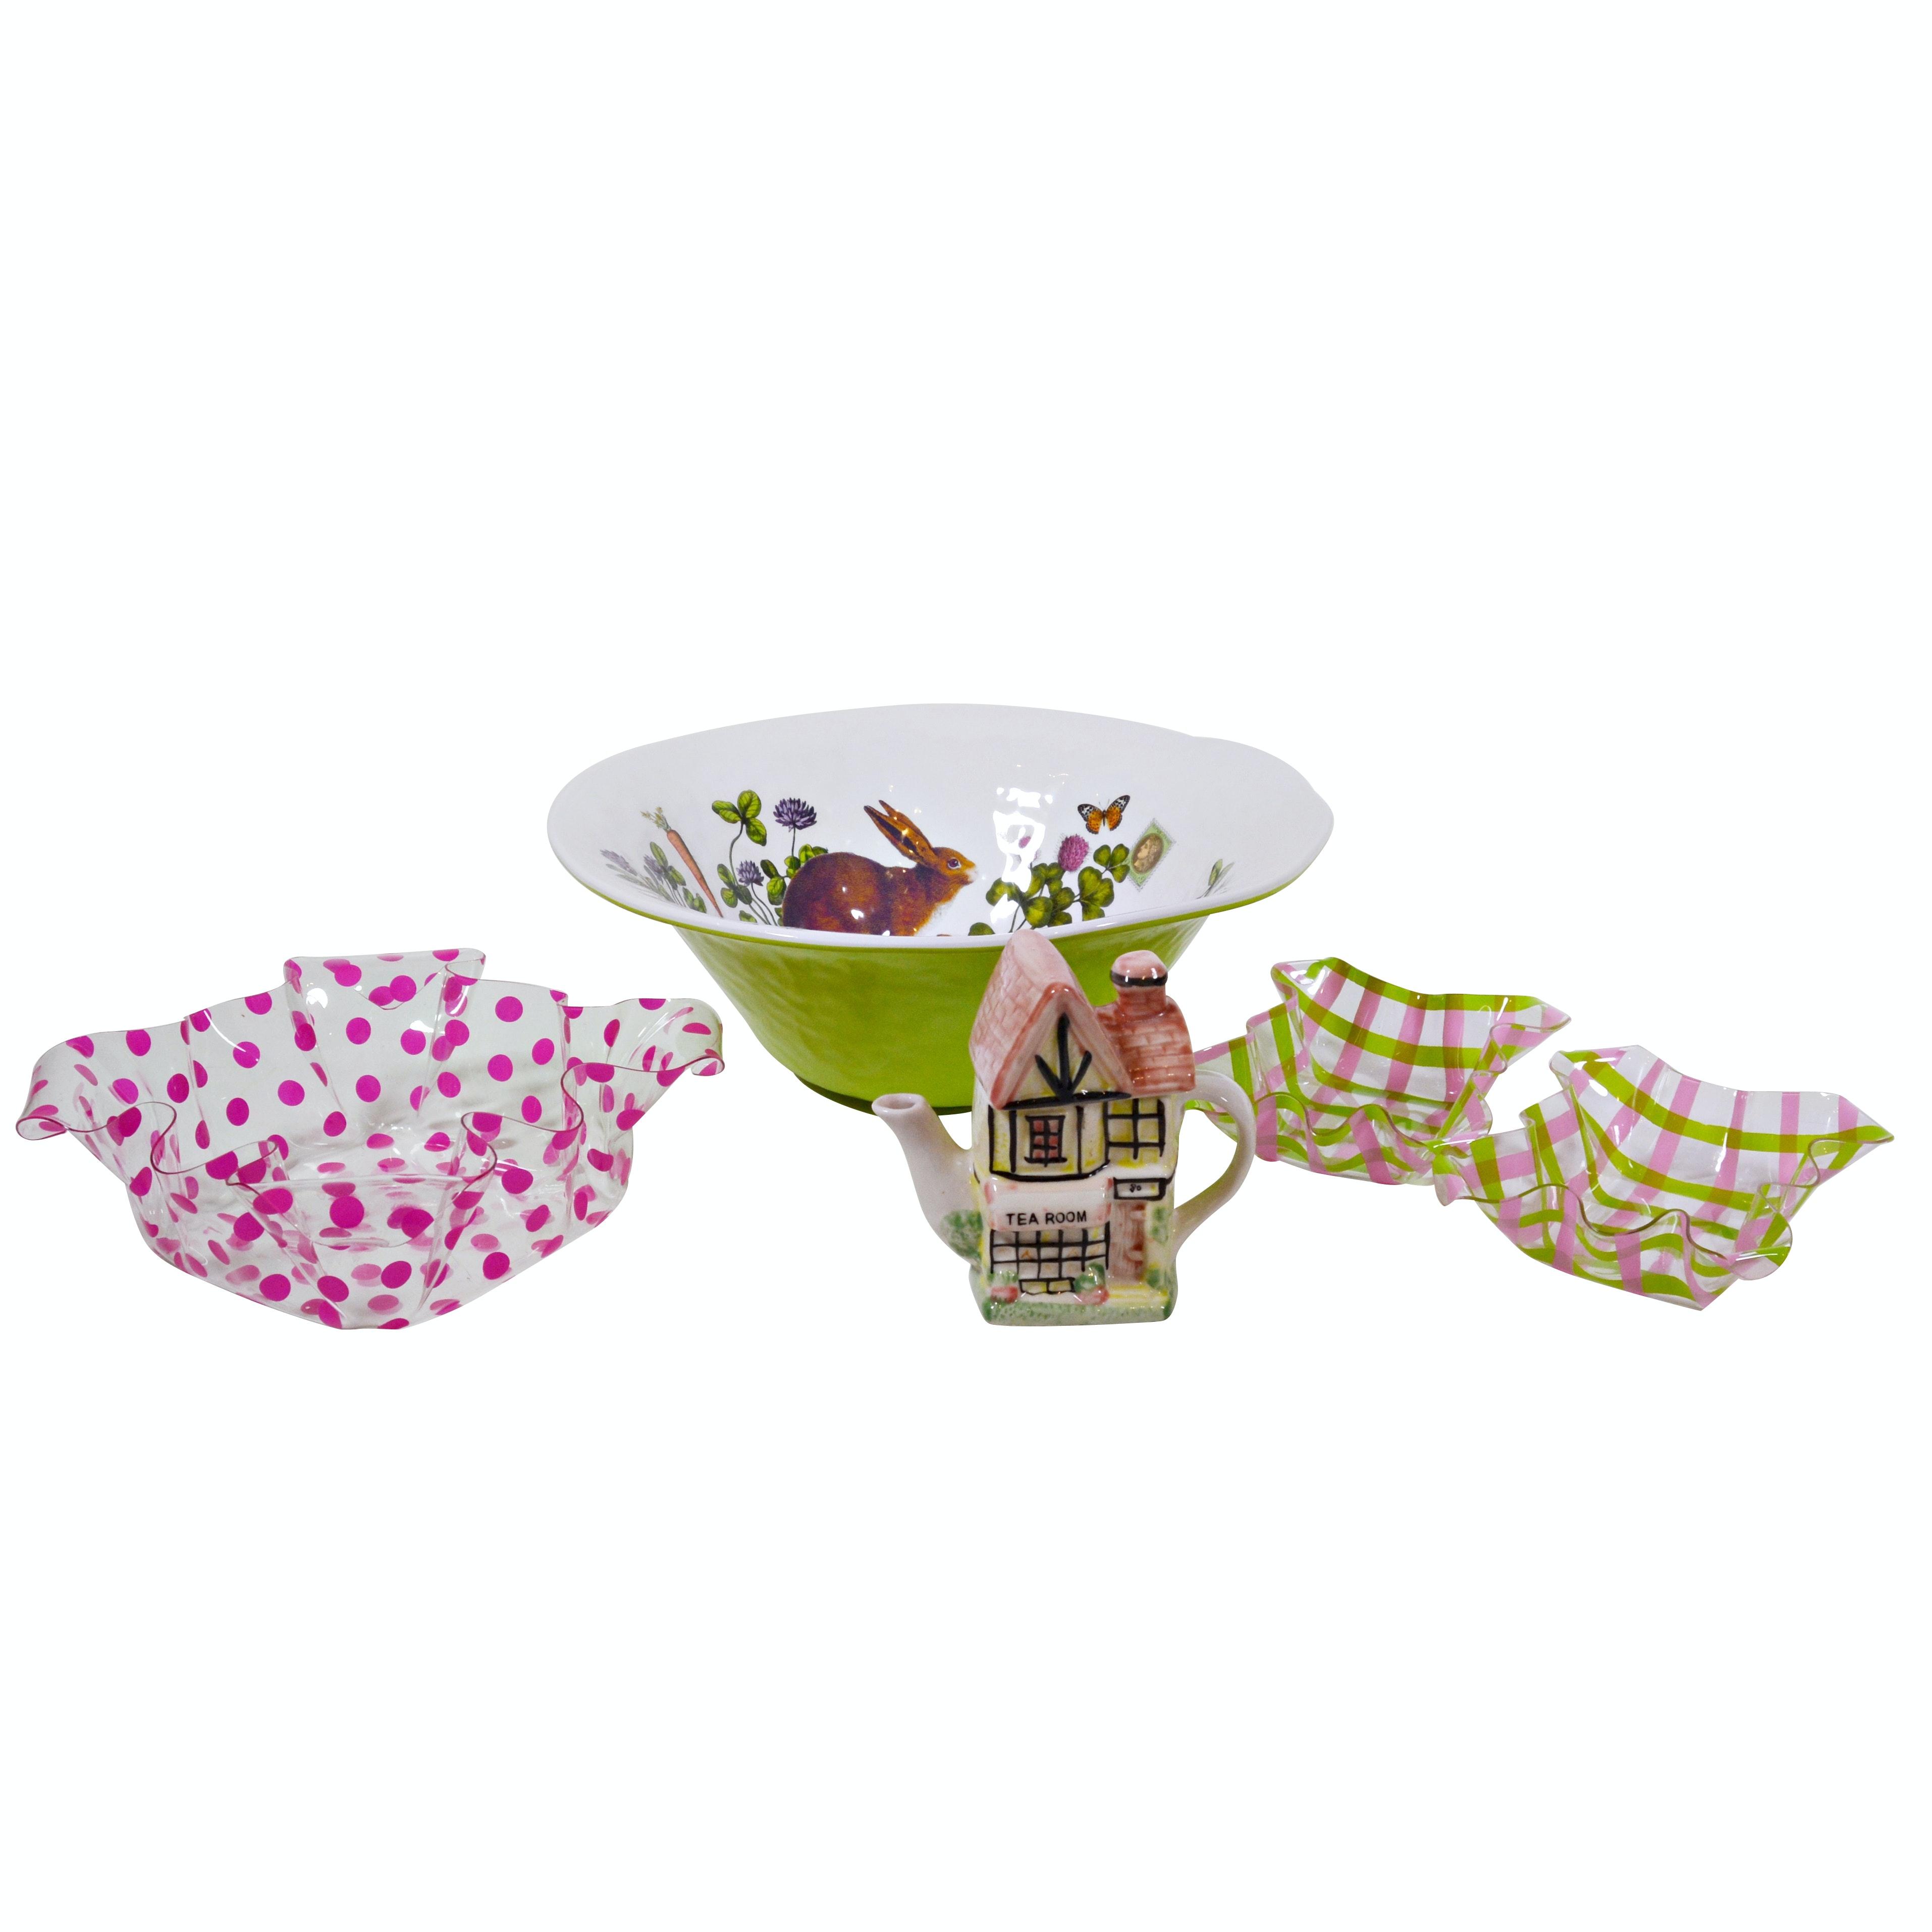 Melamine Bunny Bowl, Teapot and Plastic Ruffle Bowls